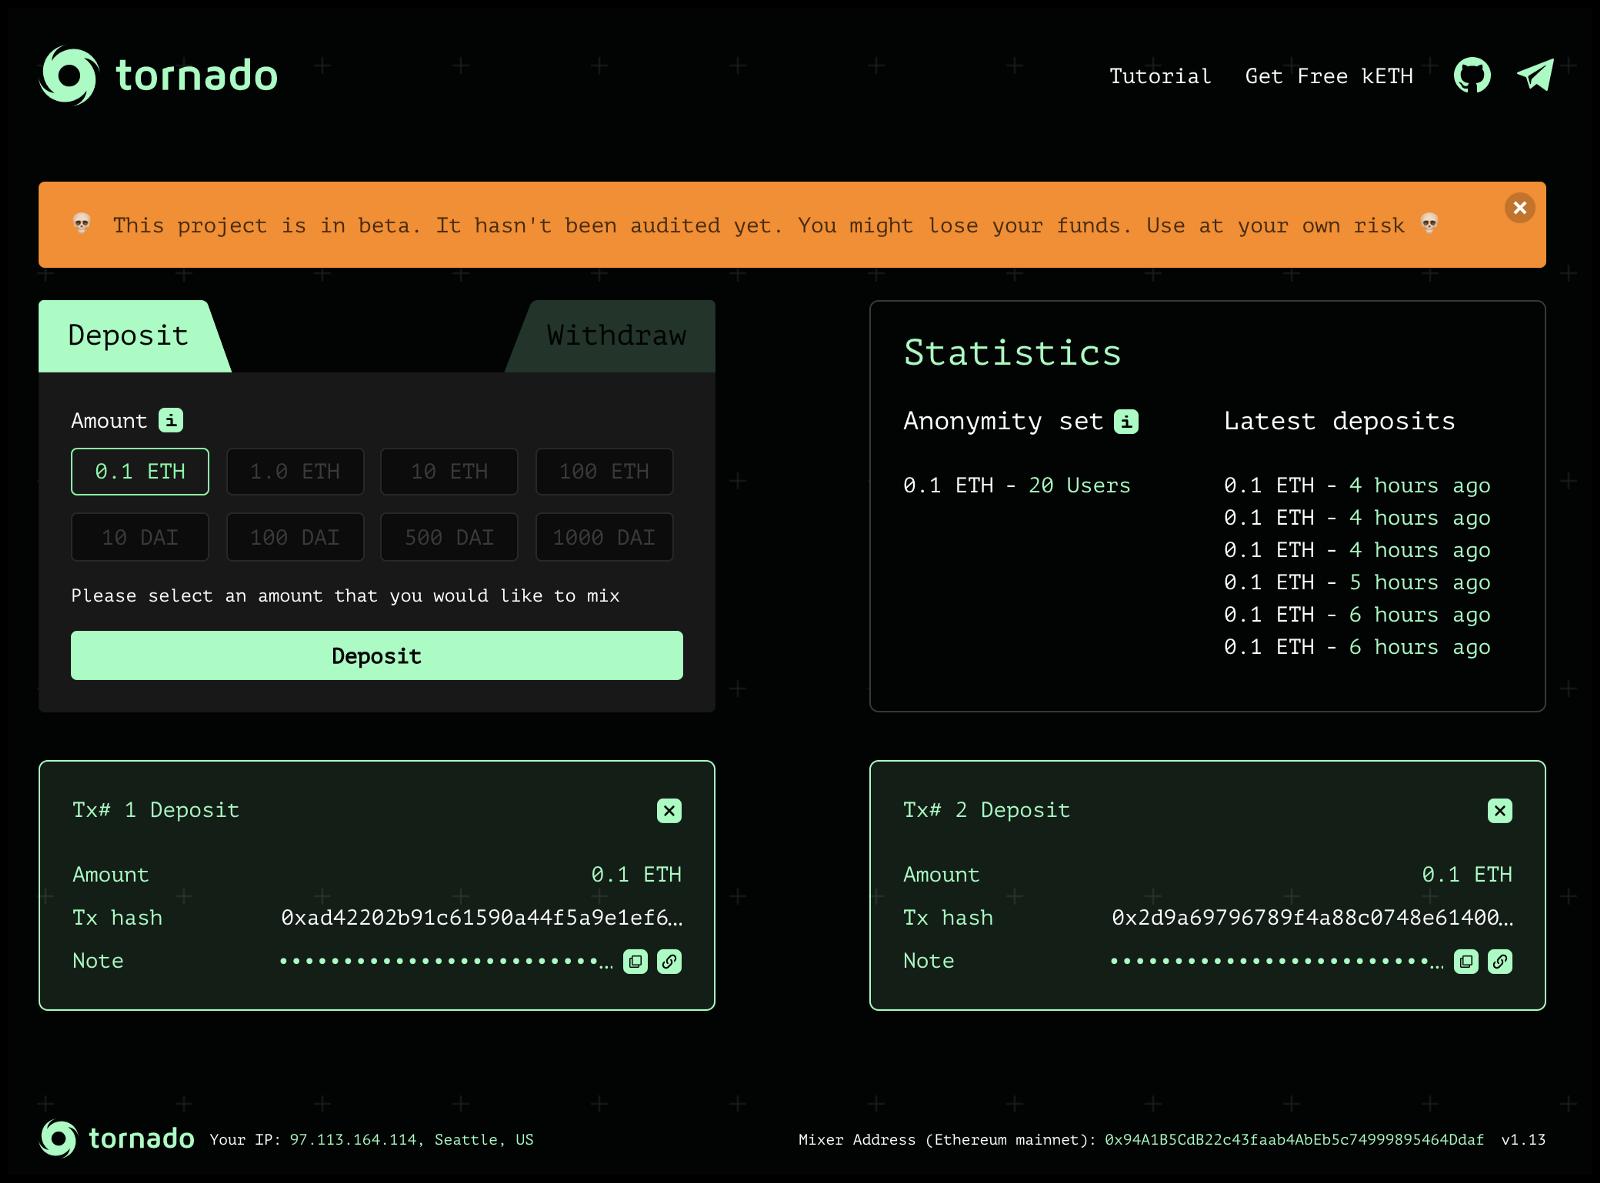 "Gavin Andresen habla sobre la privacidad de Ethereum Tornado and Wallet ""width ="" 1600 ""height ="" 1183 ""srcset ="" https://blackswanfinances.com/wp-content/uploads/2020/01/0memkh9go4sgc3toj.png 1600w, https: //news.bitcoin.com/wp-content/uploads/2020/01/0memkh9go4sgc3toj-300x222.png 300w, https://news.bitcoin.com/wp-content/uploads/2020/01/0memkh9go4sgc3toj-1024x757.png 1024w, https://news.bitcoin.com/wp-content/uploads/2020/01/0memkh9go4sgc3toj-768x568.png 768w, https://news.bitcoin.com/wp-content/uploads/2020/01/0memkh9go4sgc3toj -1536x1136.png 1536w, https://news.bitcoin.com/wp-content/uploads/2020/01/0memkh9go4sgc3toj-80x60.png 80w, https://news.bitcoin.com/wp-content/uploads/2020 /01/0memkh9go4sgc3toj-485x360.png 485w, https://news.bitcoin.com/wp-content/uploads/2020/01/0me mkh9go4sgc3toj-696x515.png 696w, https://news.bitcoin.com/wp-content/uploads/2020/01/0memkh9go4sgc3toj-1392x1029.png 1392w, https://news.bitcoin.com/wp-content/uploads/ 2020/01 / 0memkh9go4sgc3toj-1068x790.png 1068w, https://news.bitcoin.com/wp-content/uploads/2020/01/0memkh9go4sgc3toj-568x420.png 568w ""tamaños ="" (ancho máximo: 1600px) 100vw, 1600px"